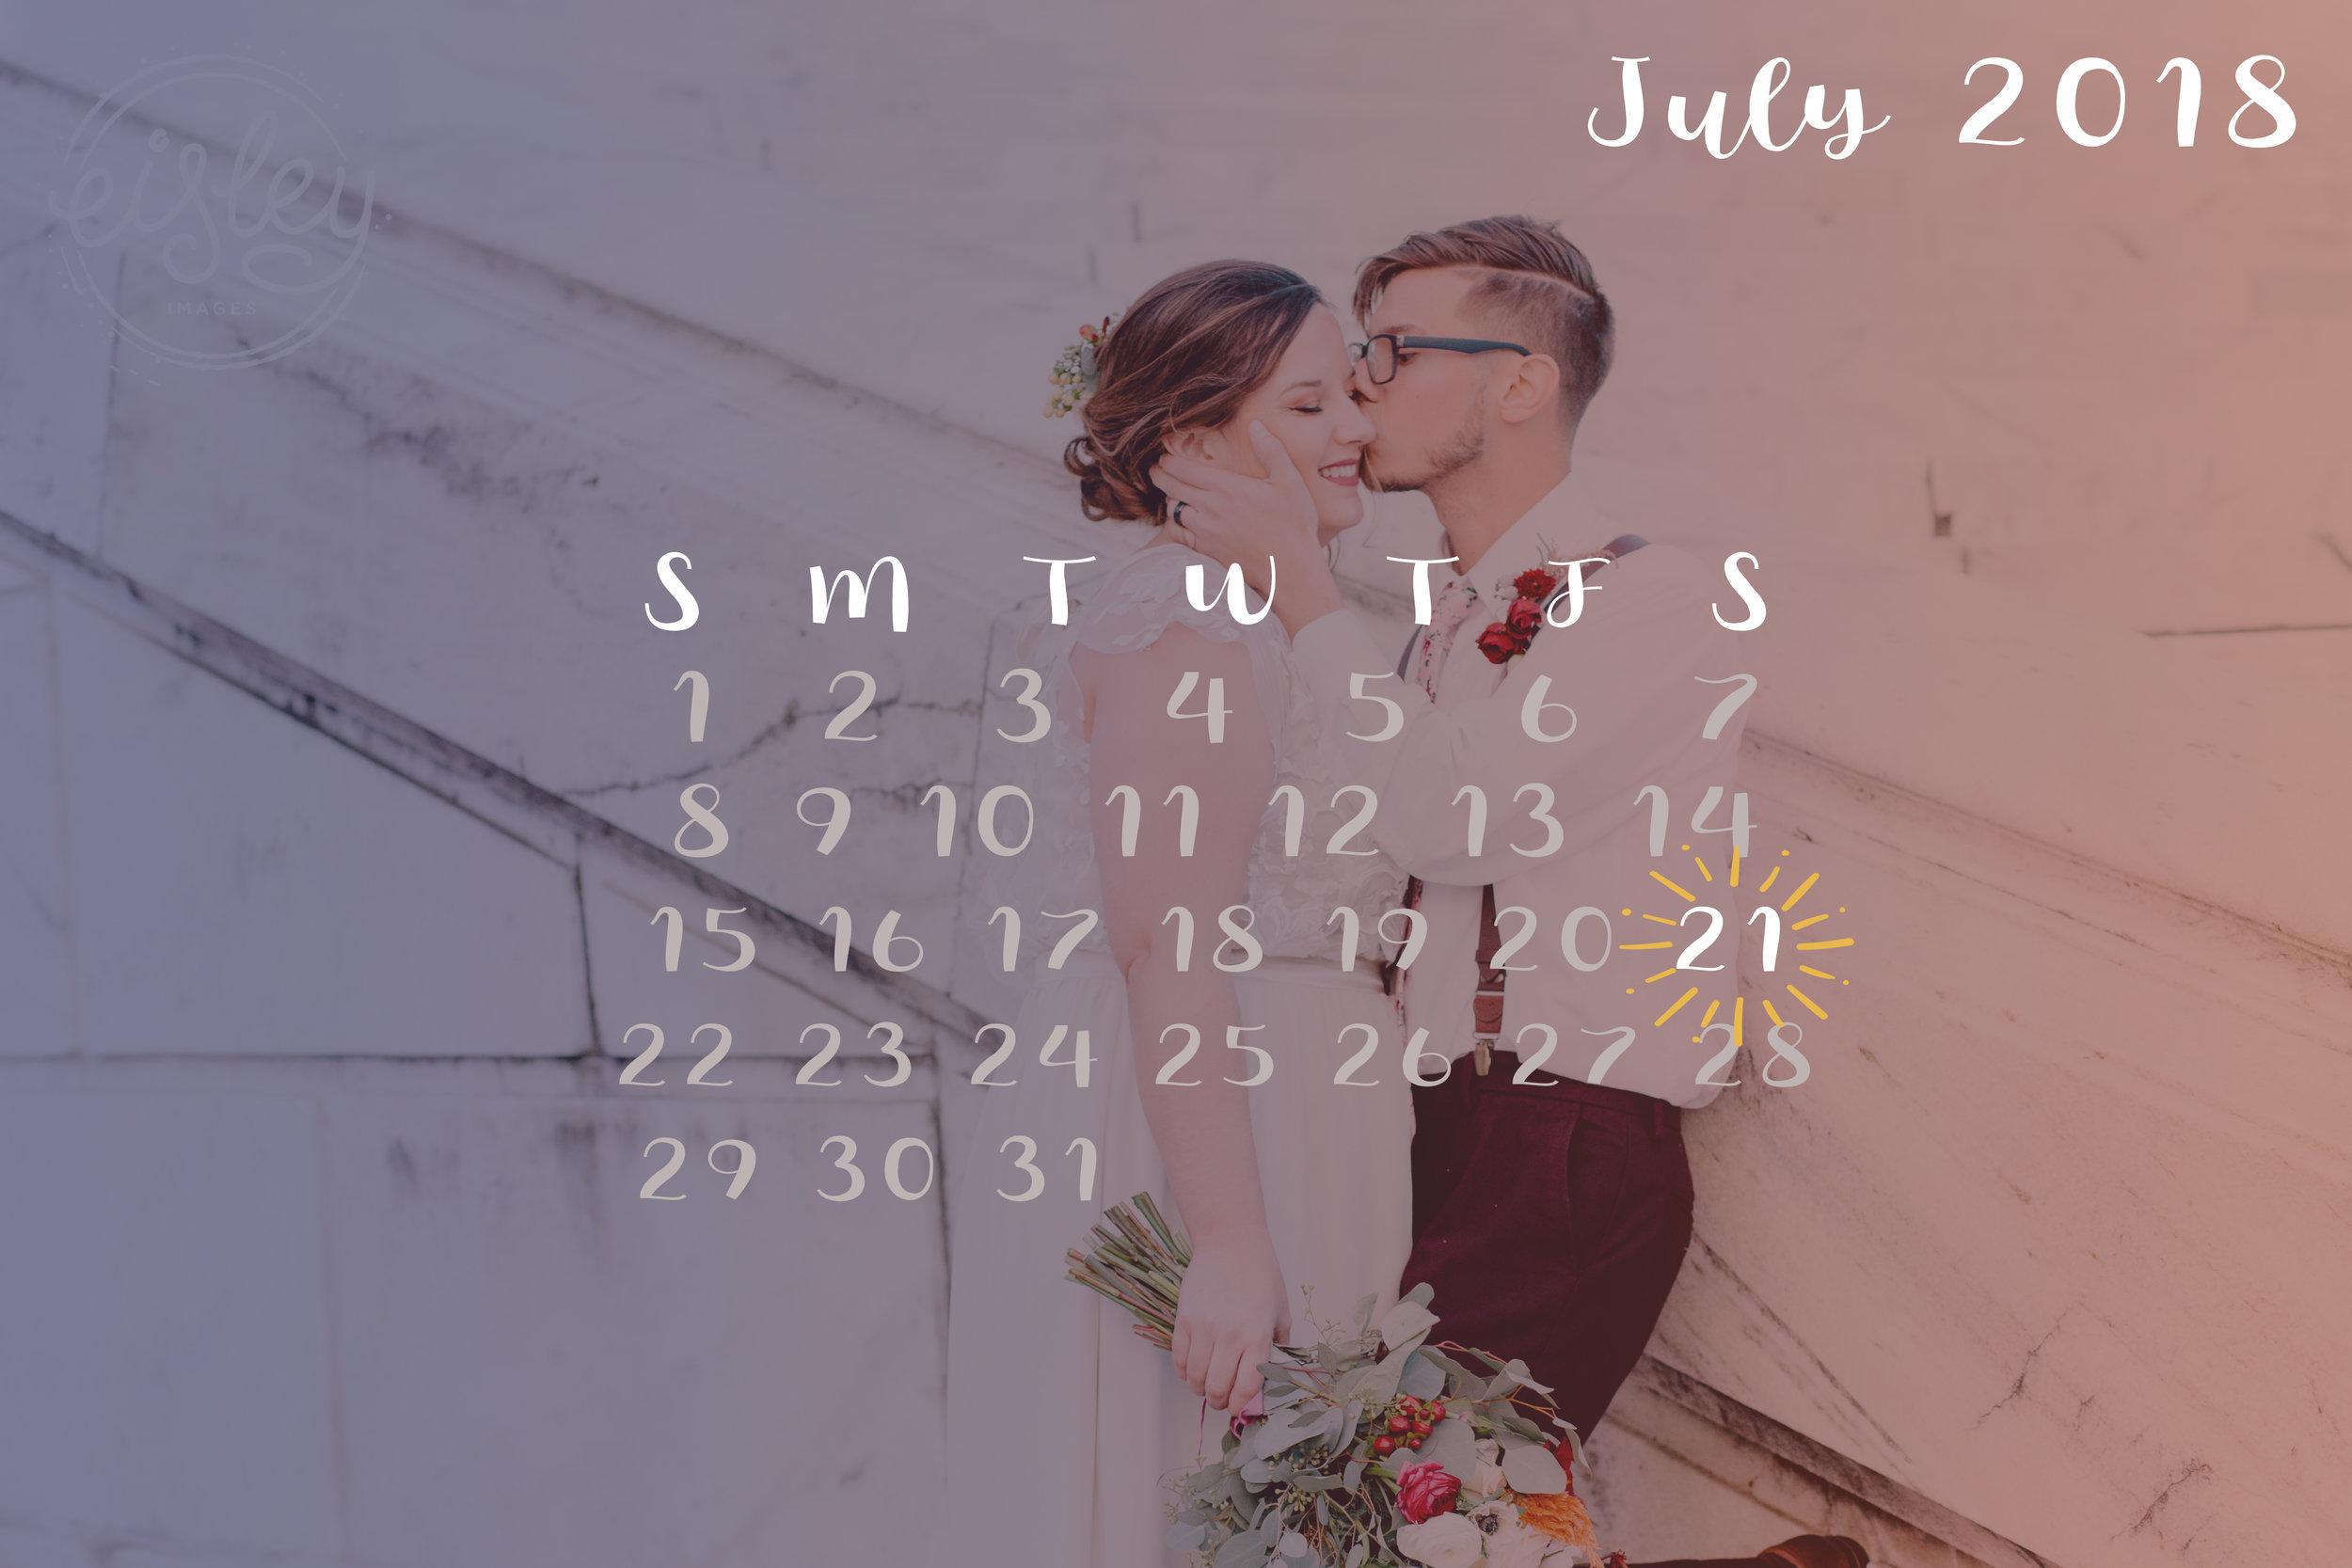 07 - july 2018.jpg